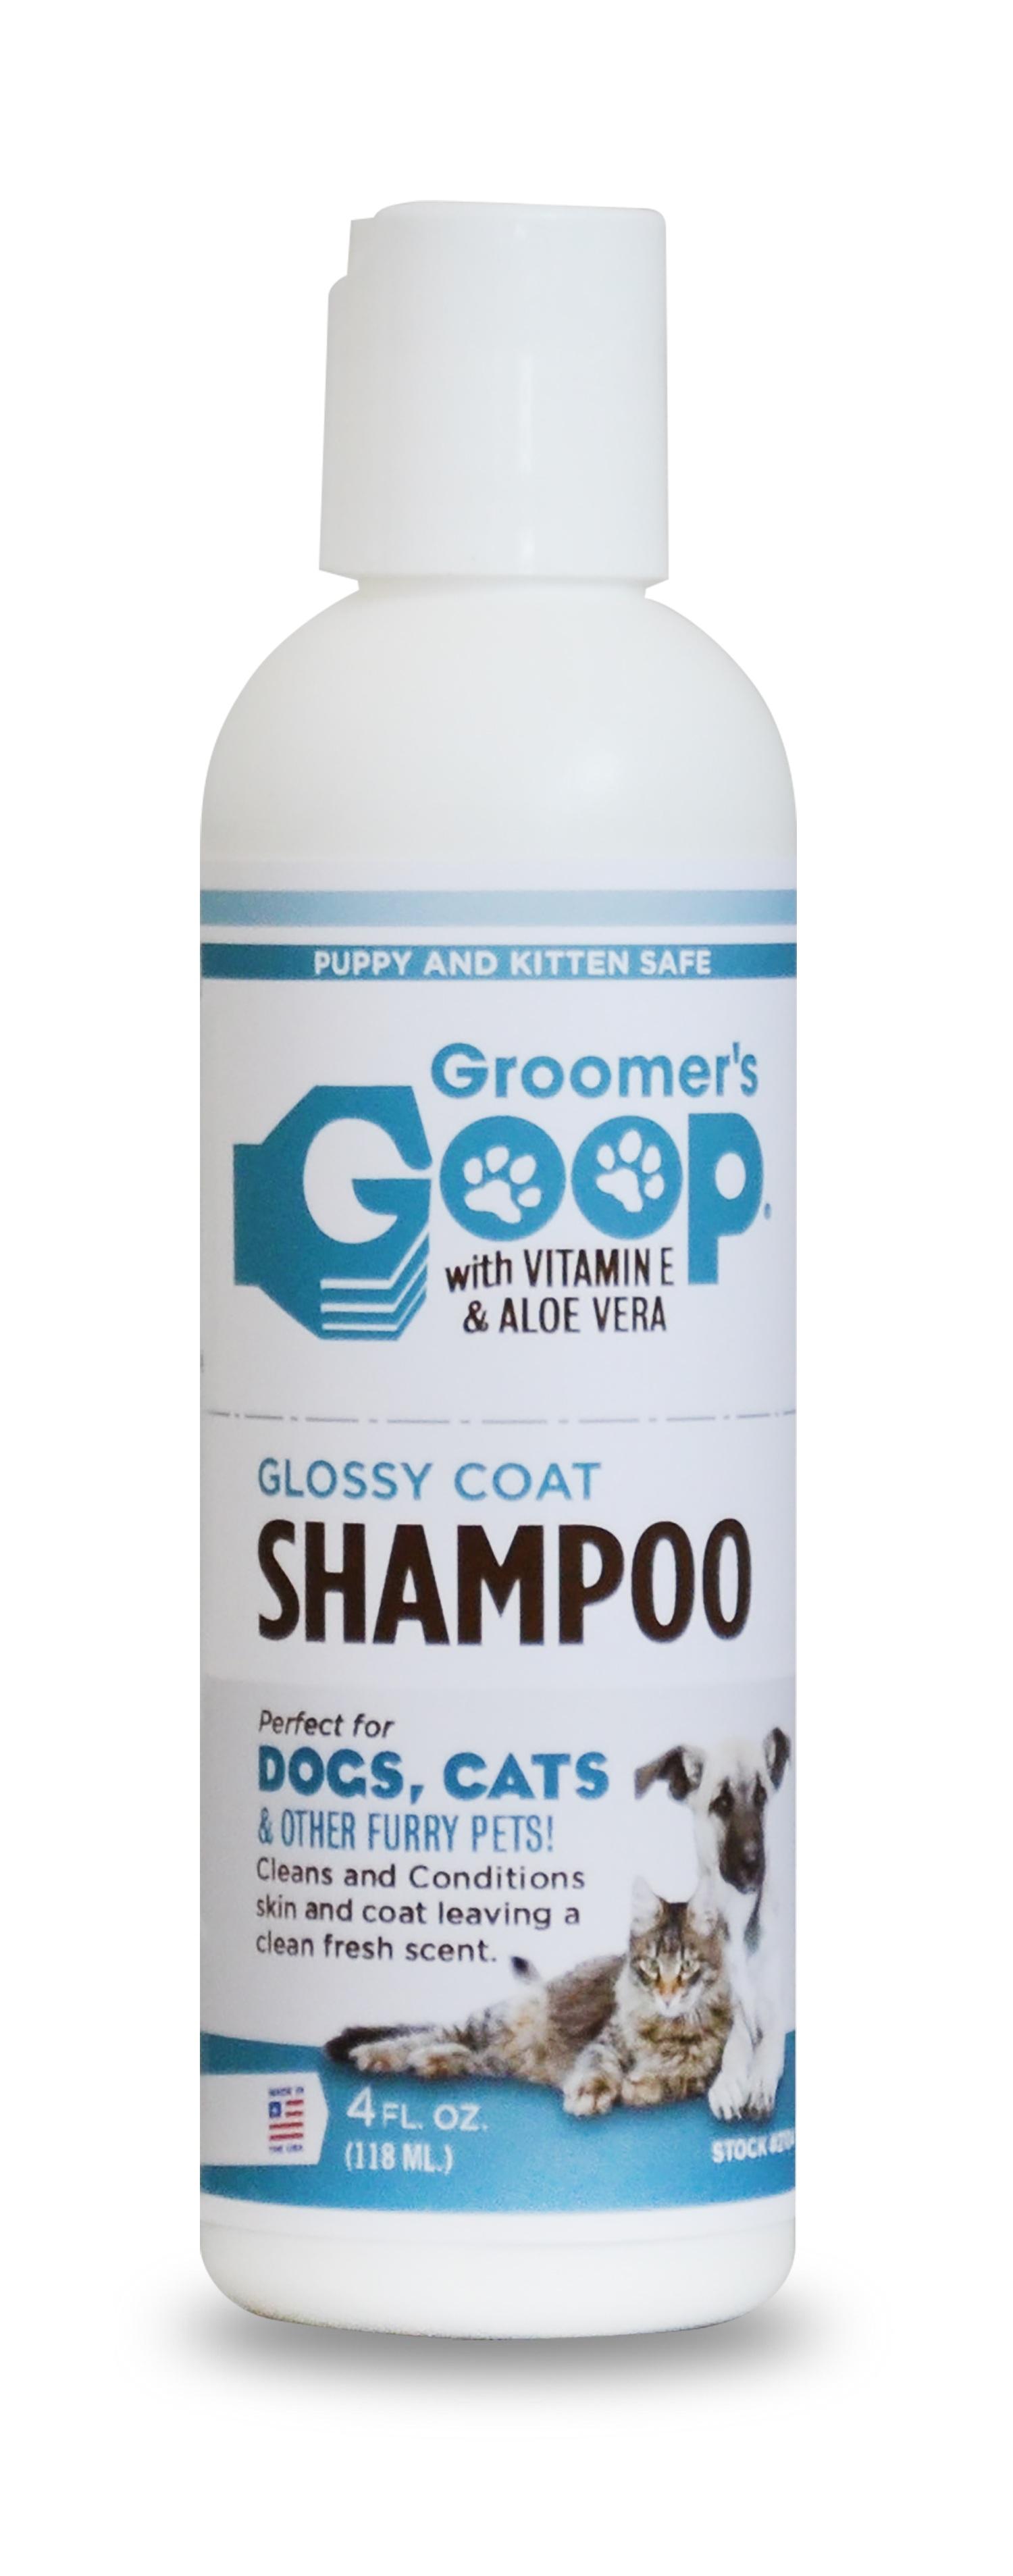 Moms-Goop-Groomers-2104-Shampoo4oz.jpg